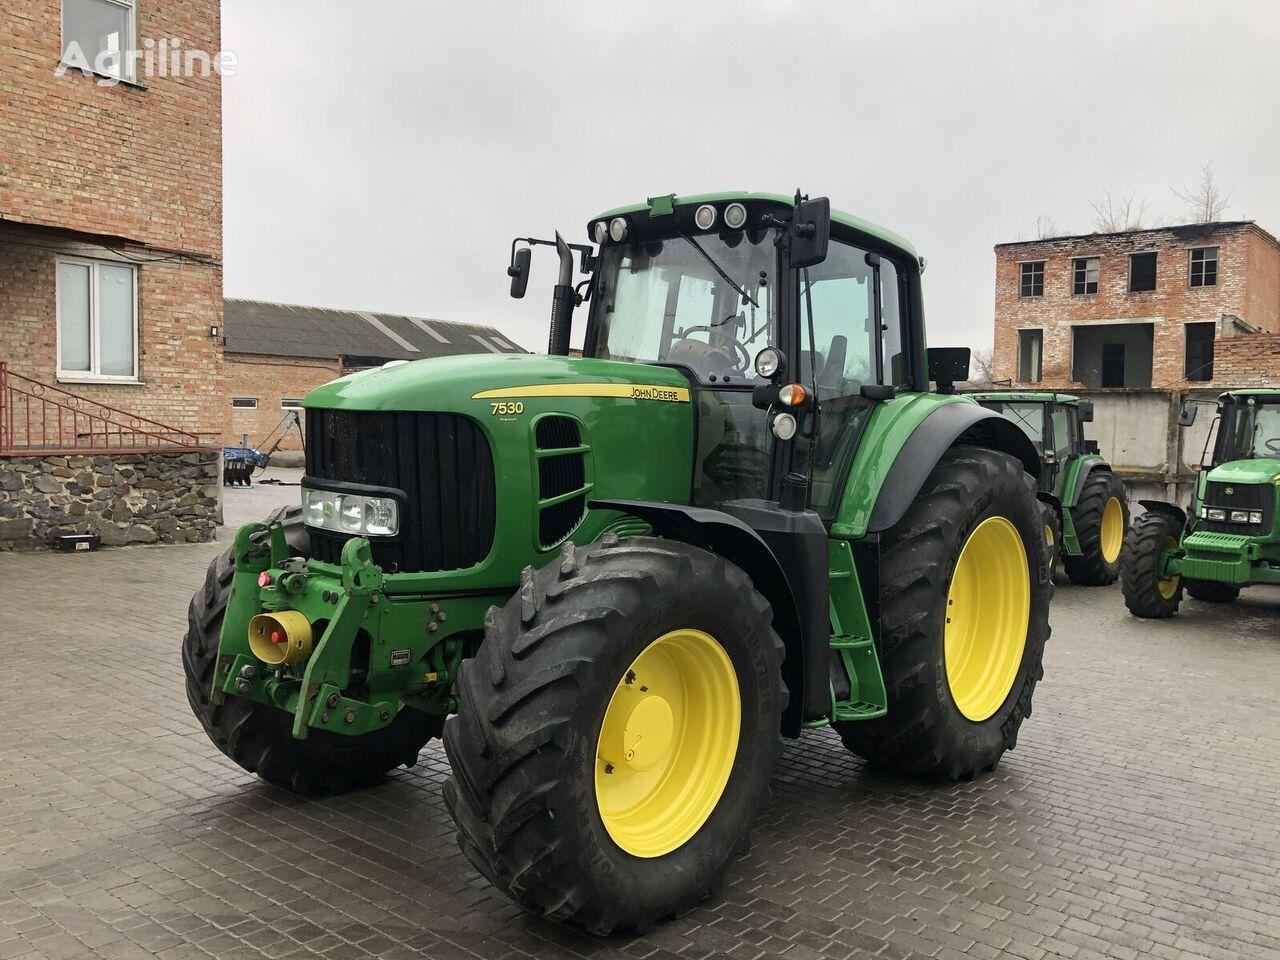 tracteur à roues JOHN DEERE 7530